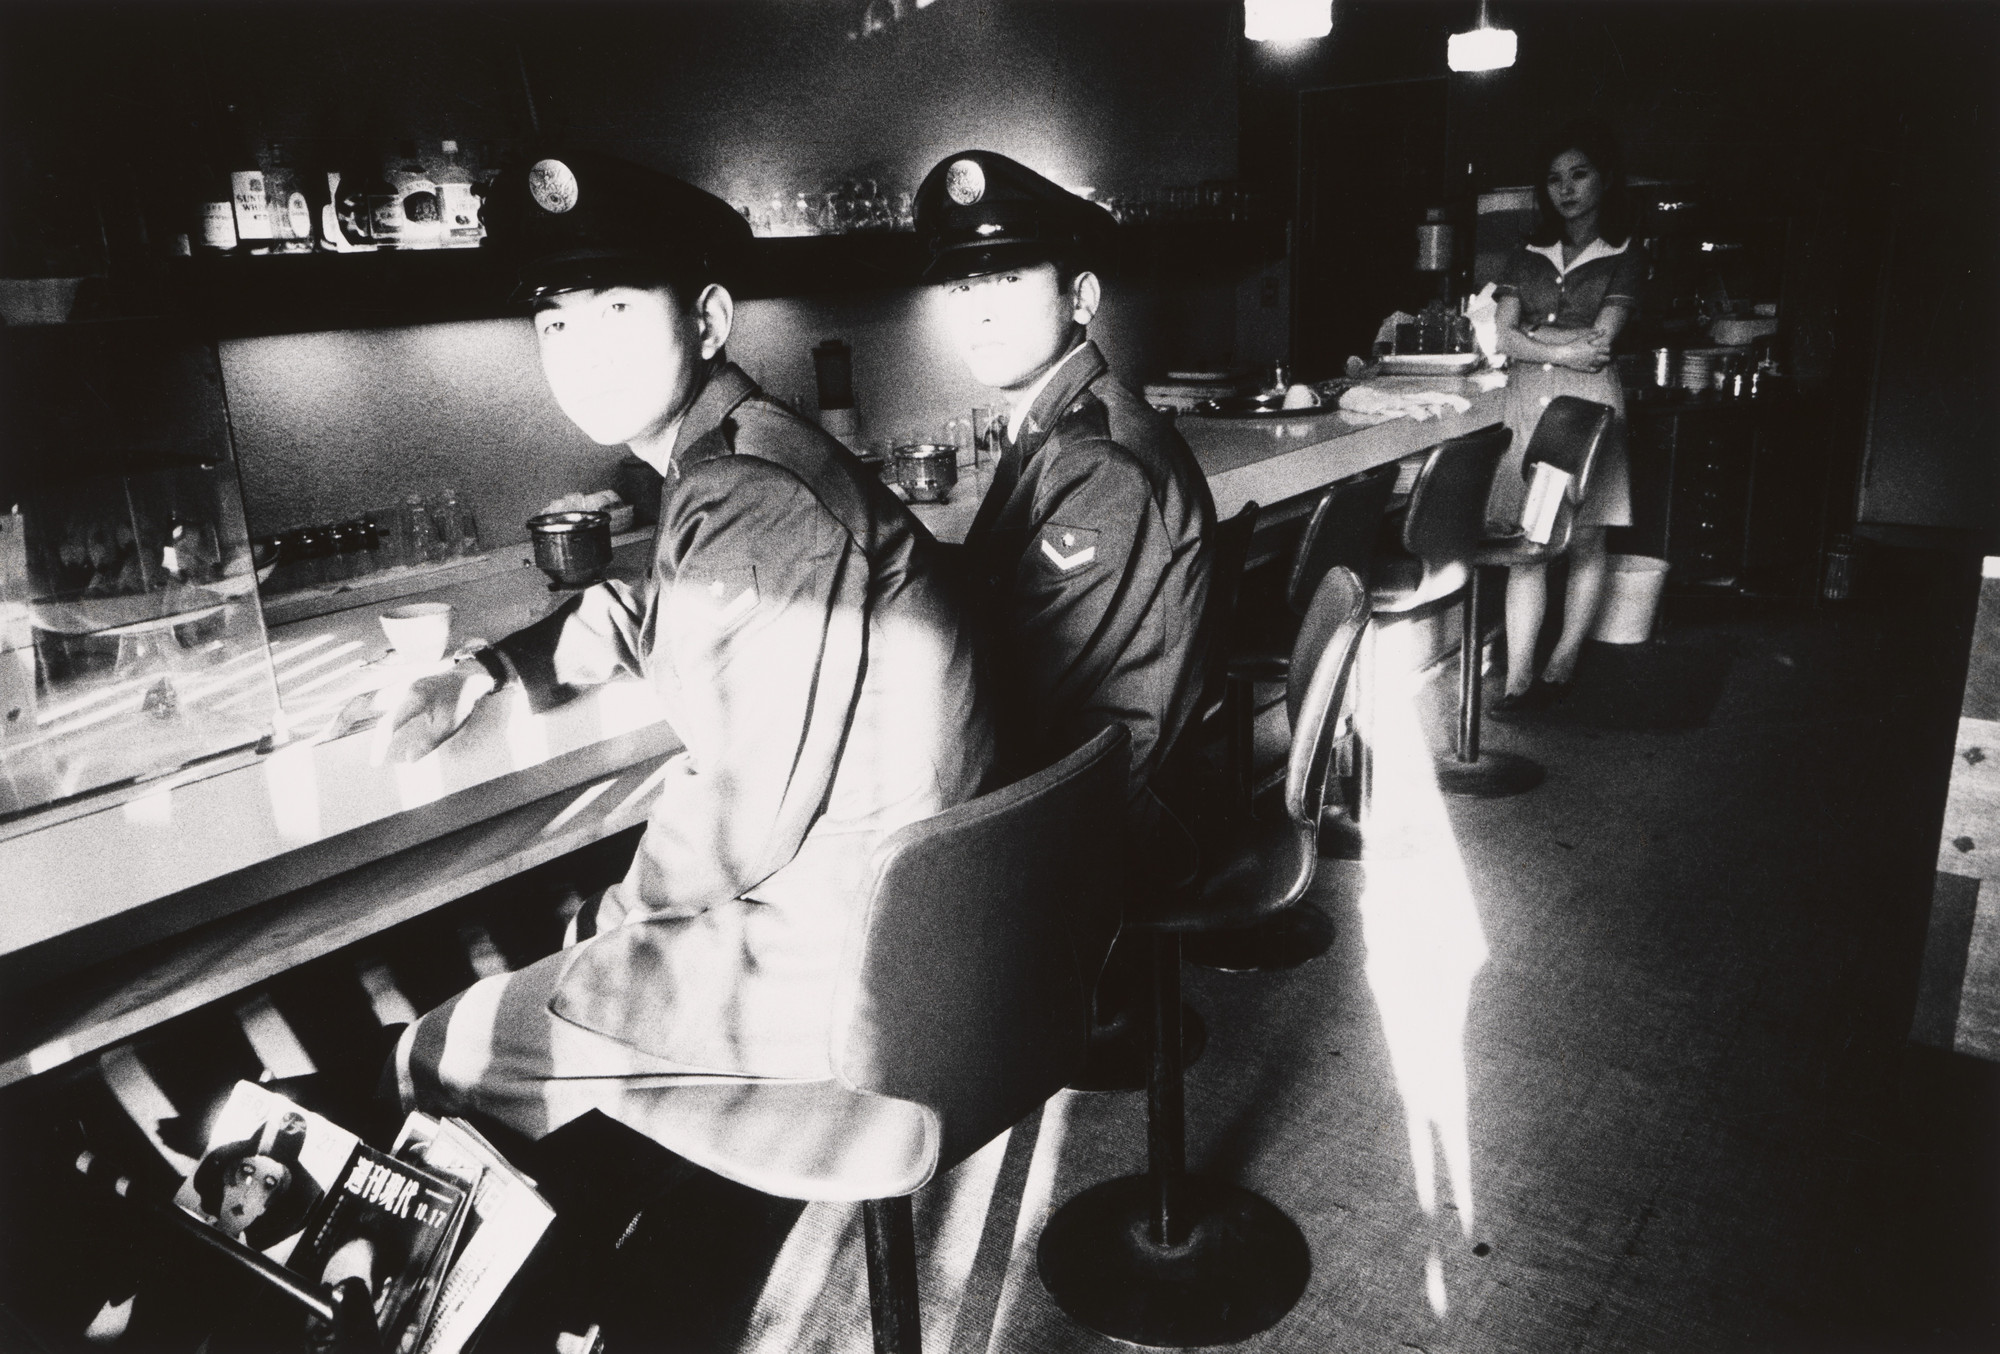 Daido Moriyama. Soldiers, Hamamatsu. 1968 | MoMA